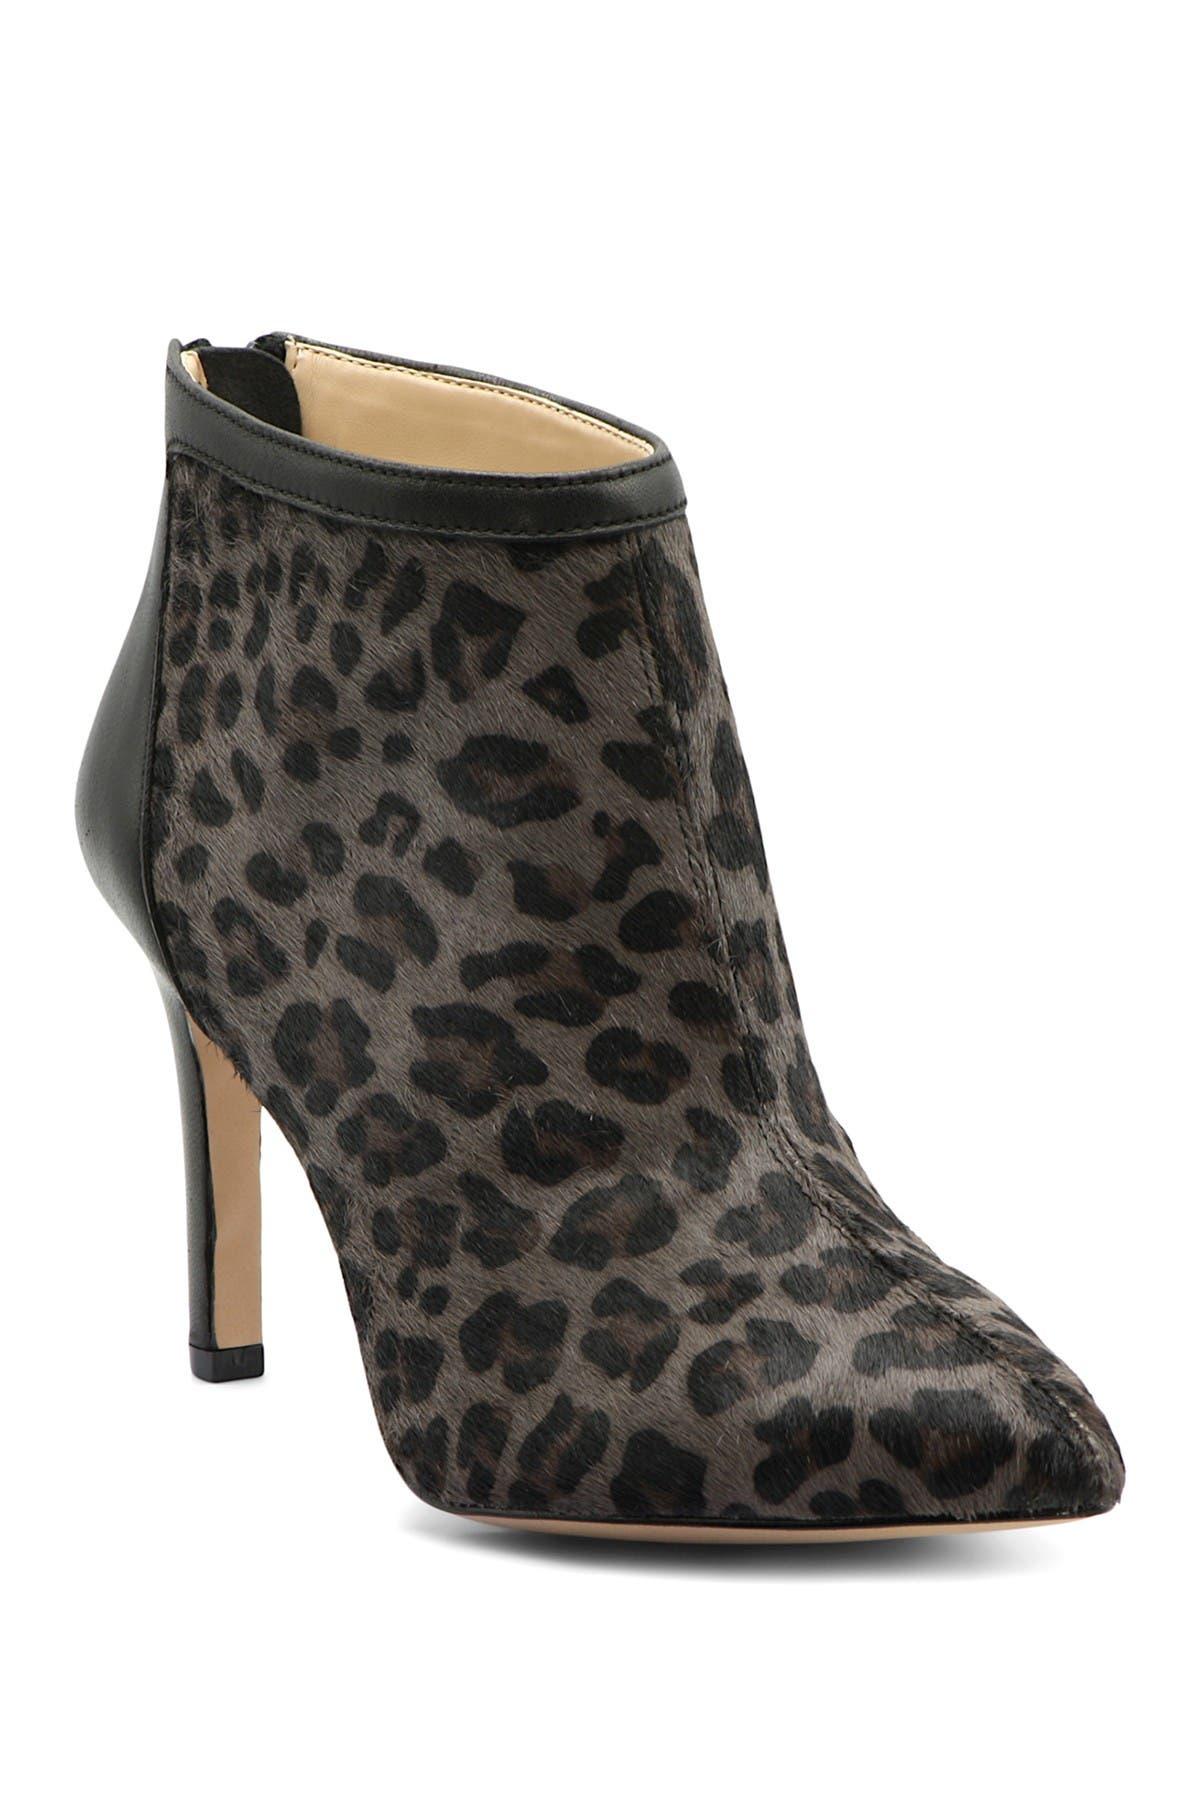 Nyla Leopard Printed Stiletto Bootie